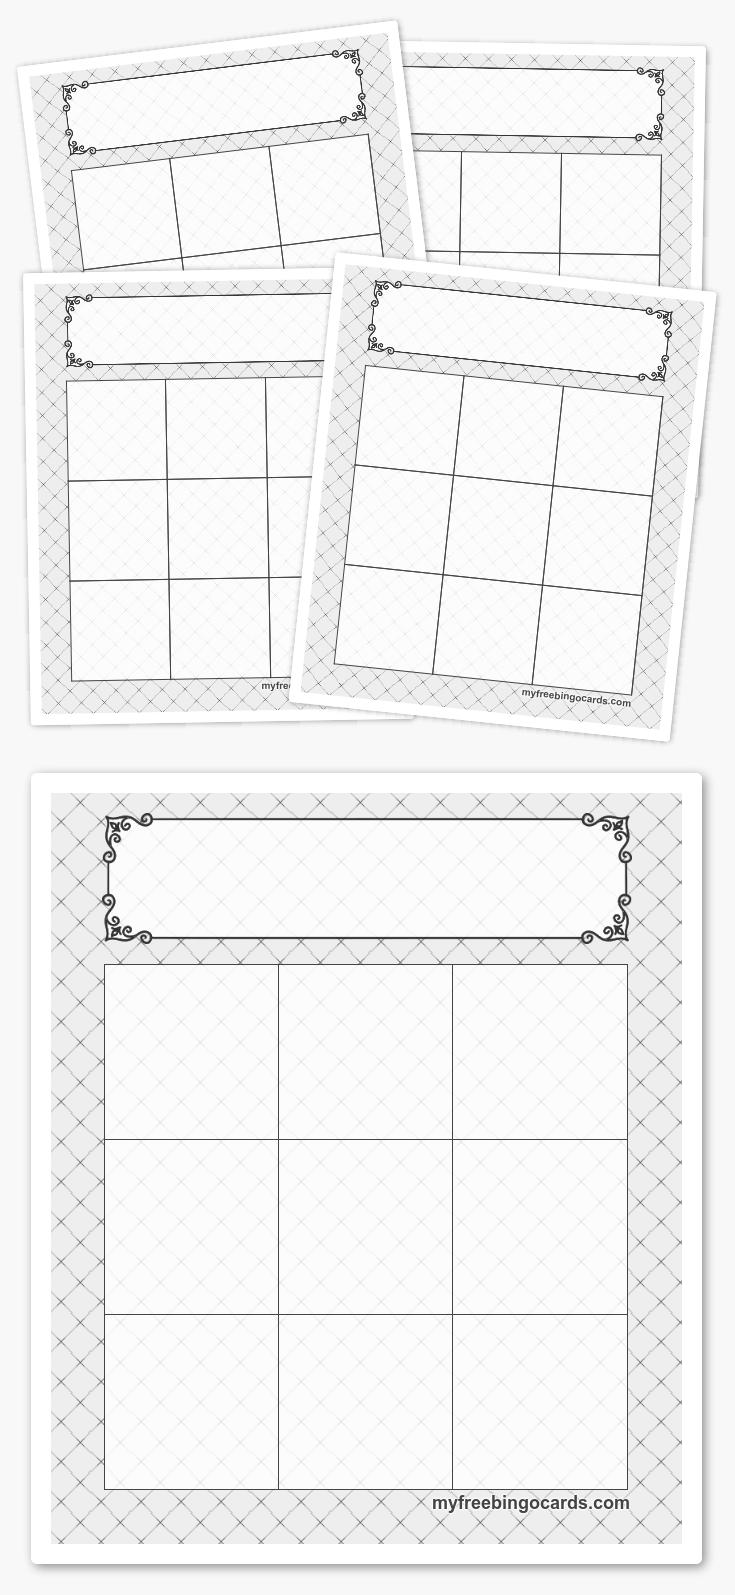 3x3 card template